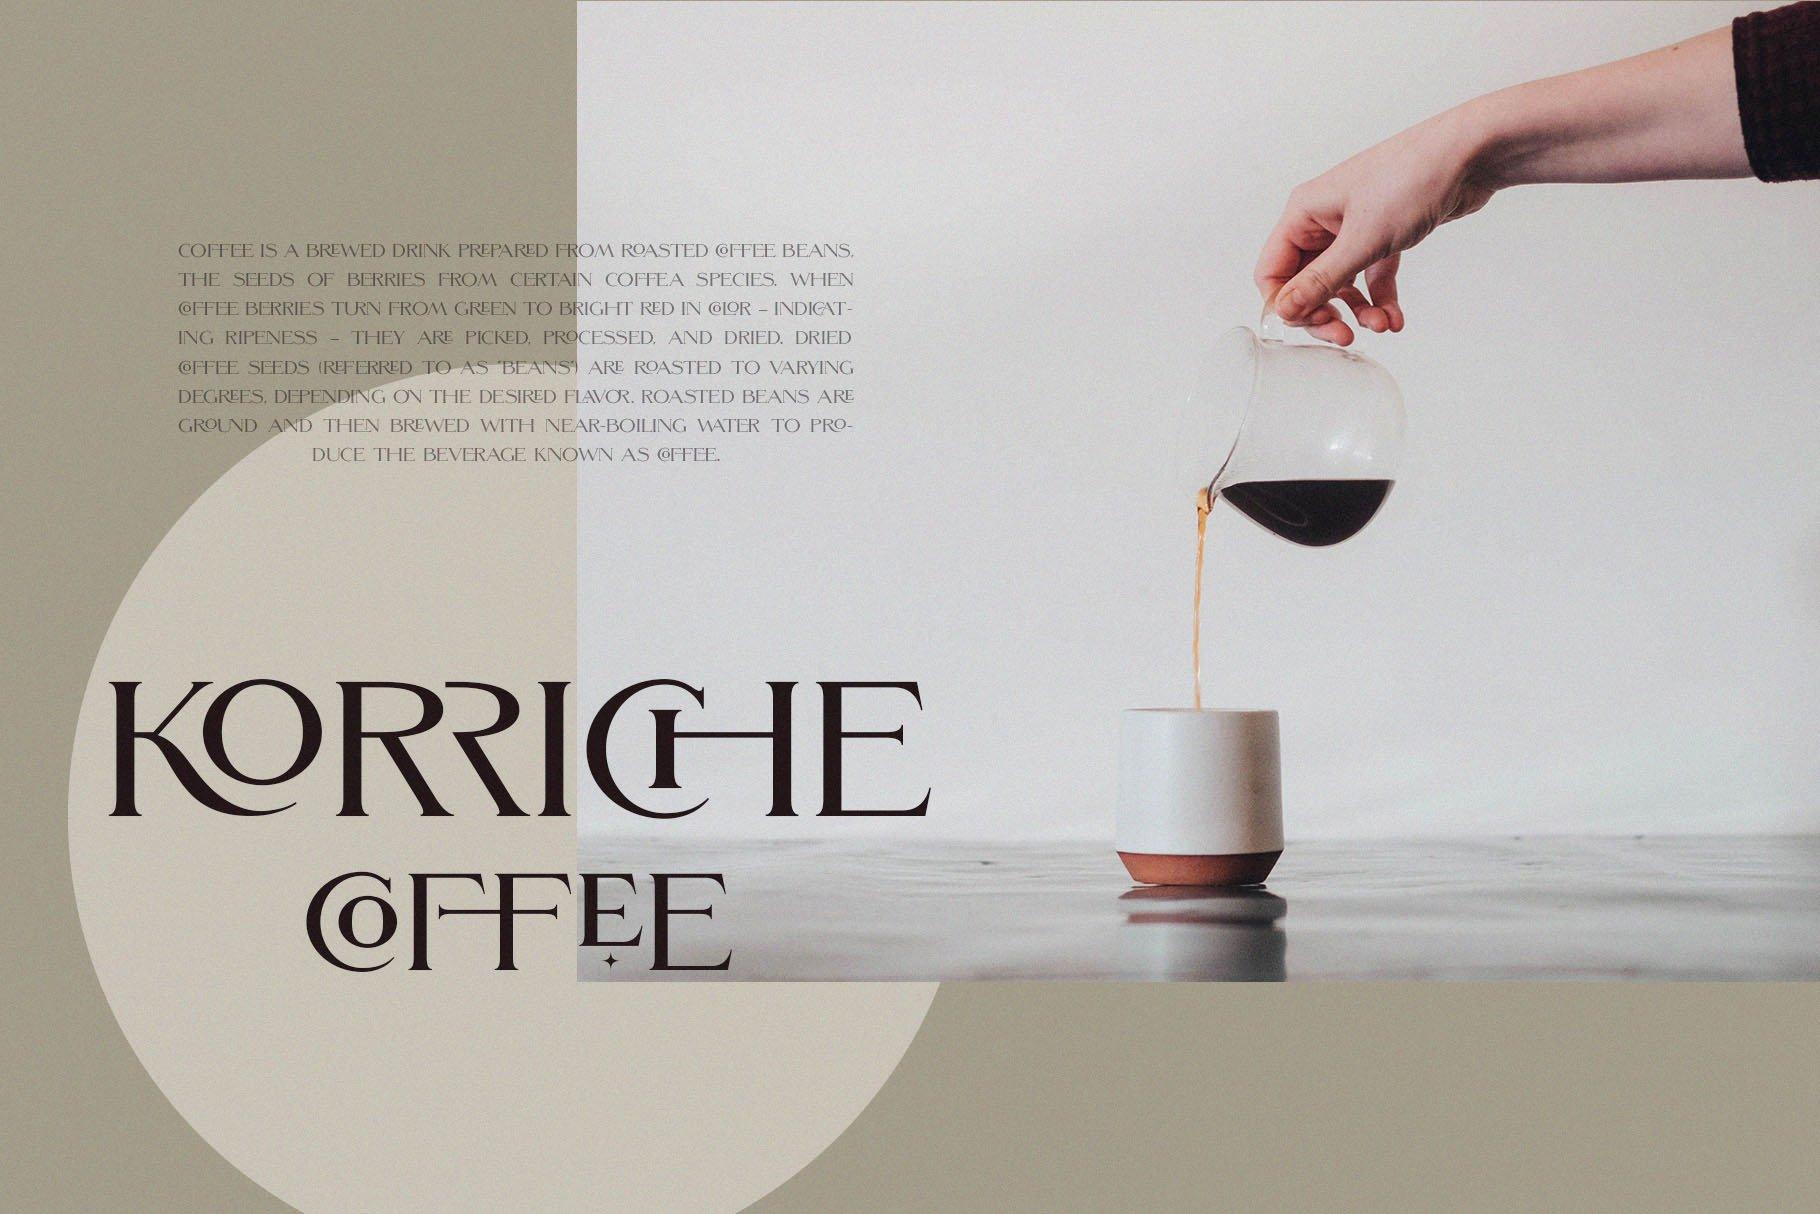 ligatures ligature font minimalist font display font classy font elegant font serif wedding font modern font logo font fashion social media modern serif 7 9